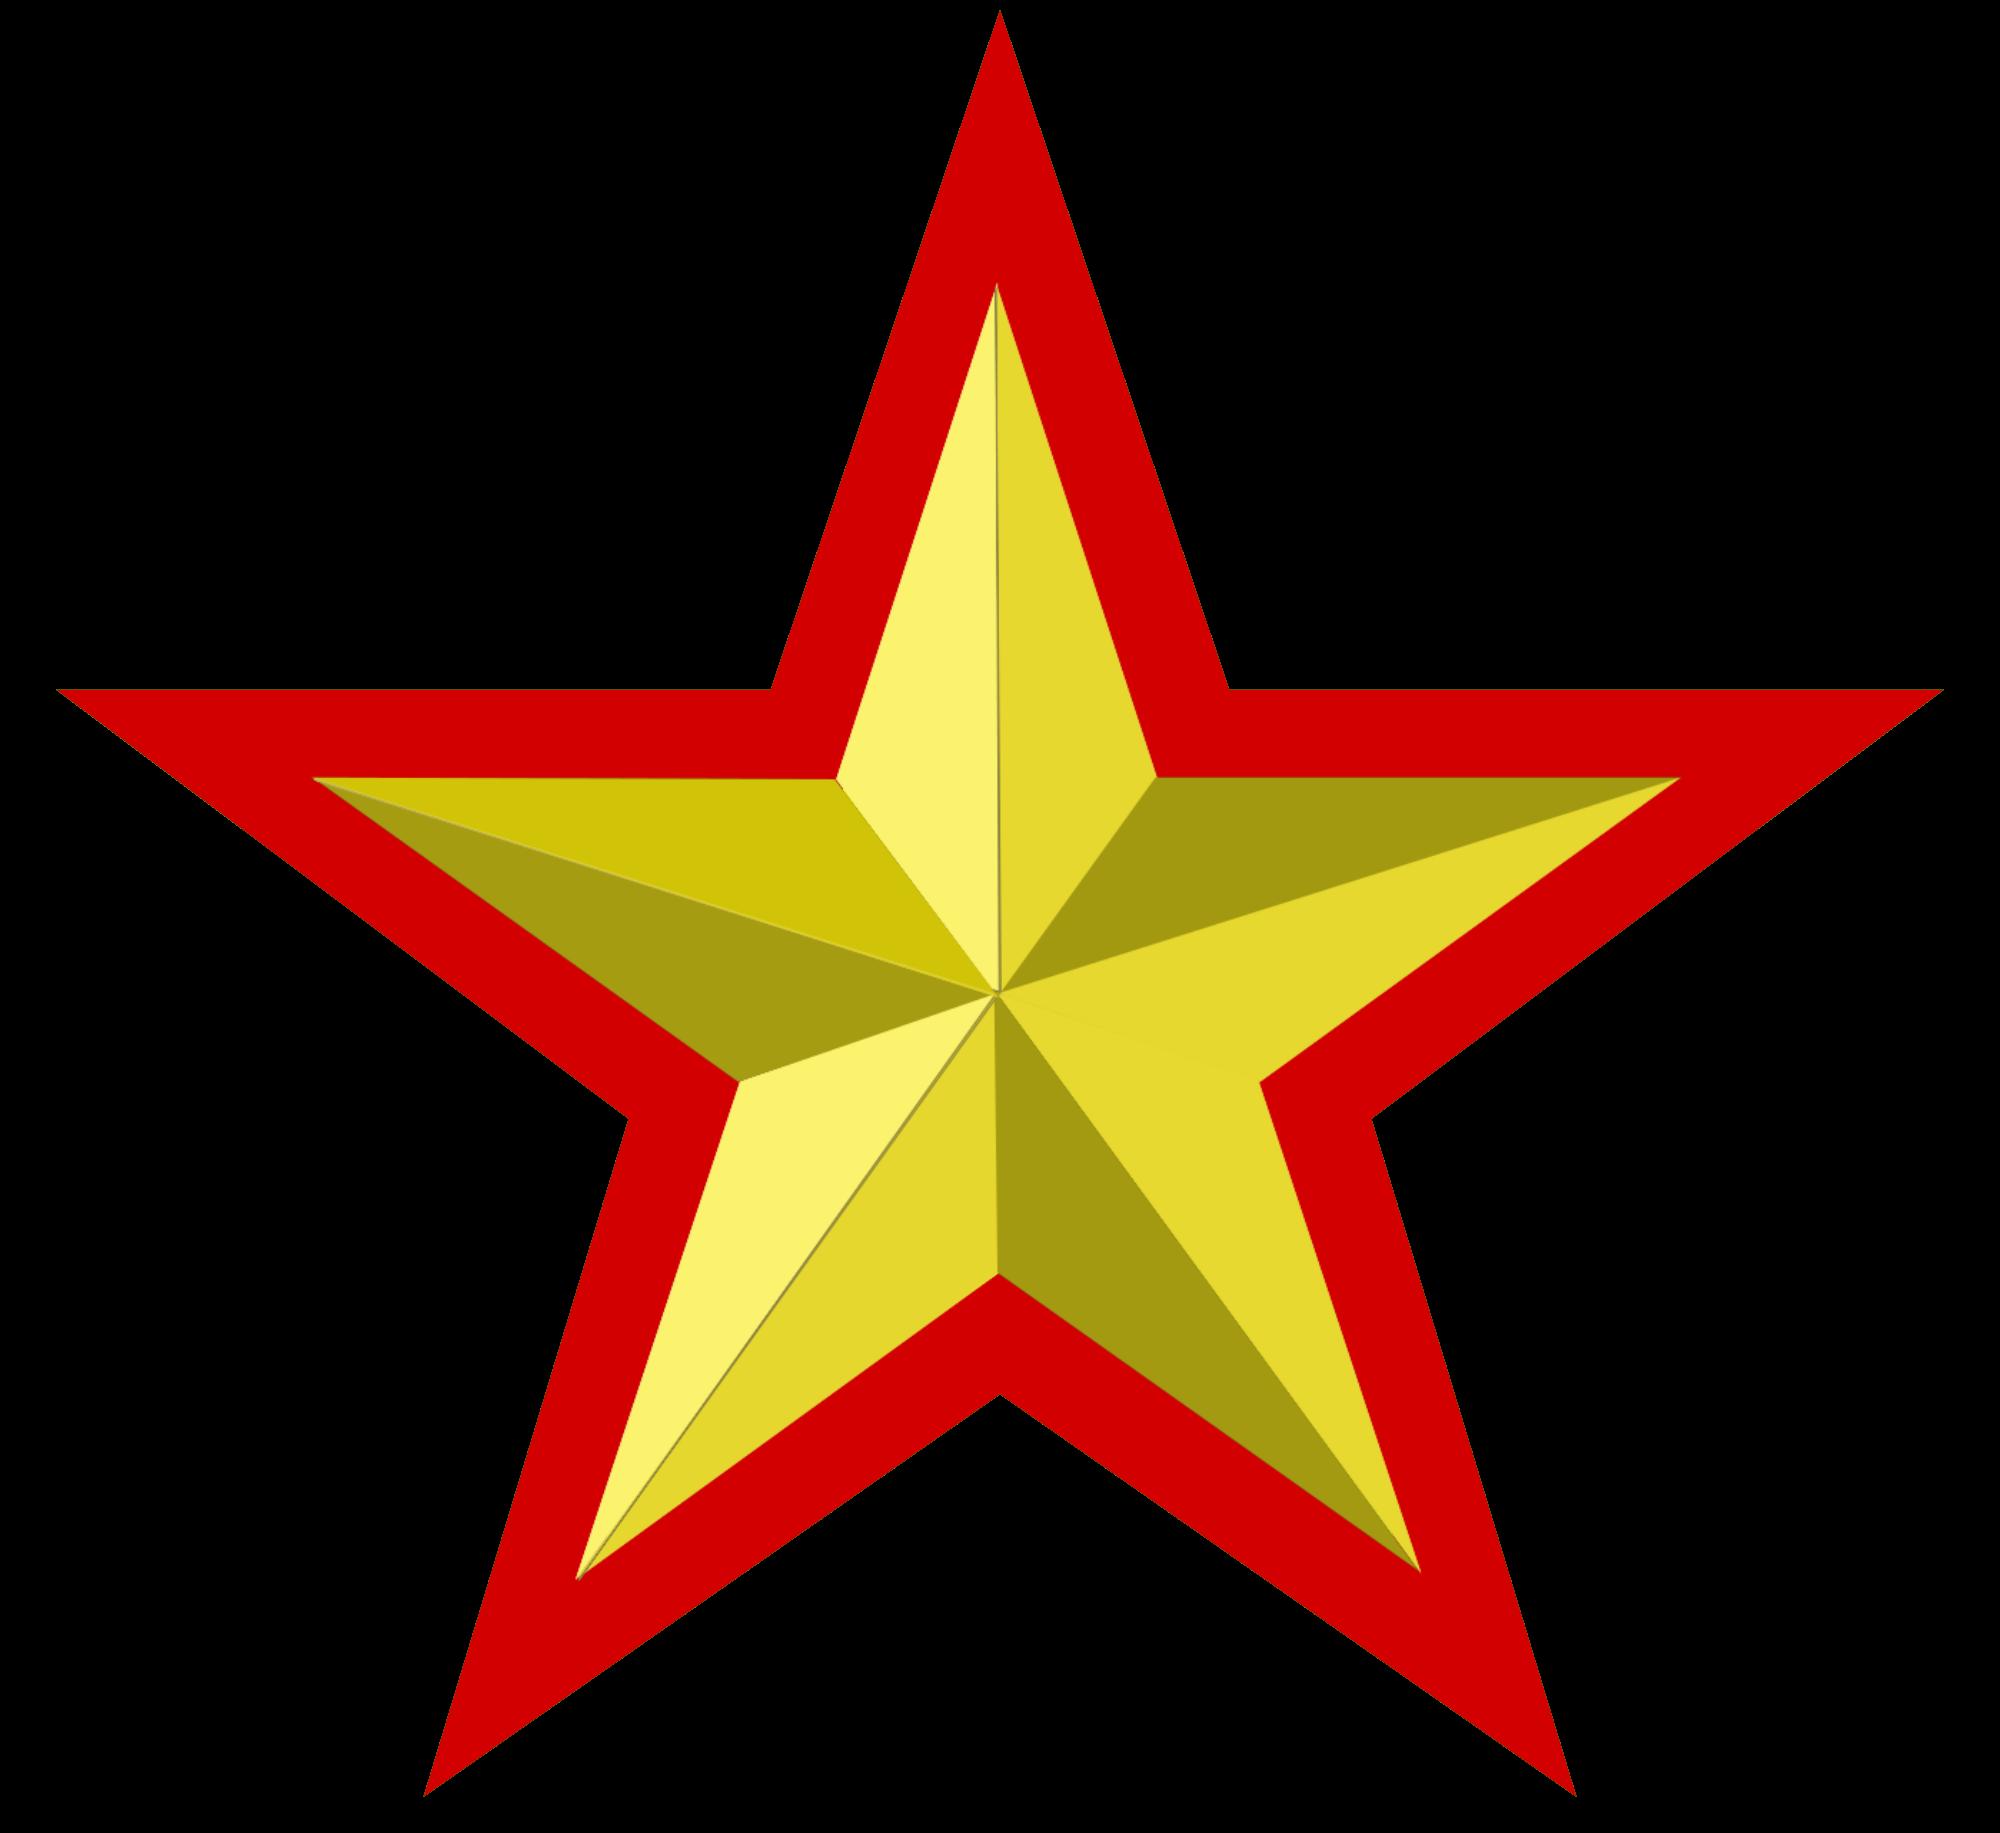 2000x1833 Red Star Border Clip Art